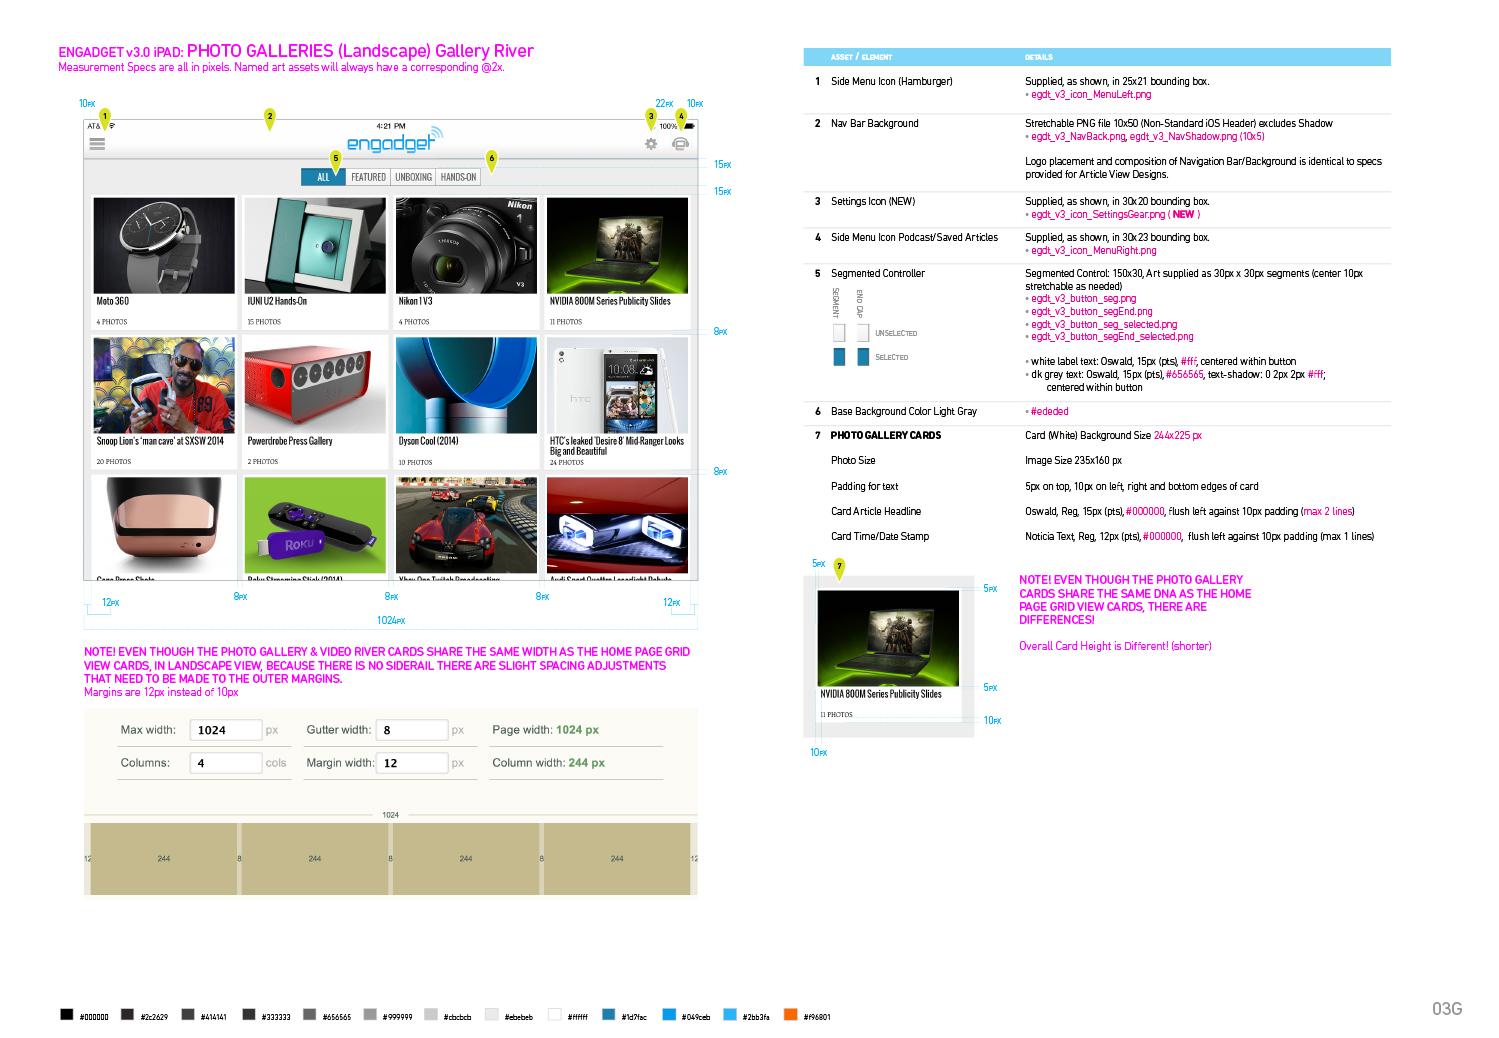 Engadget_iPad_DesignSpecs_Sample-6.jpg